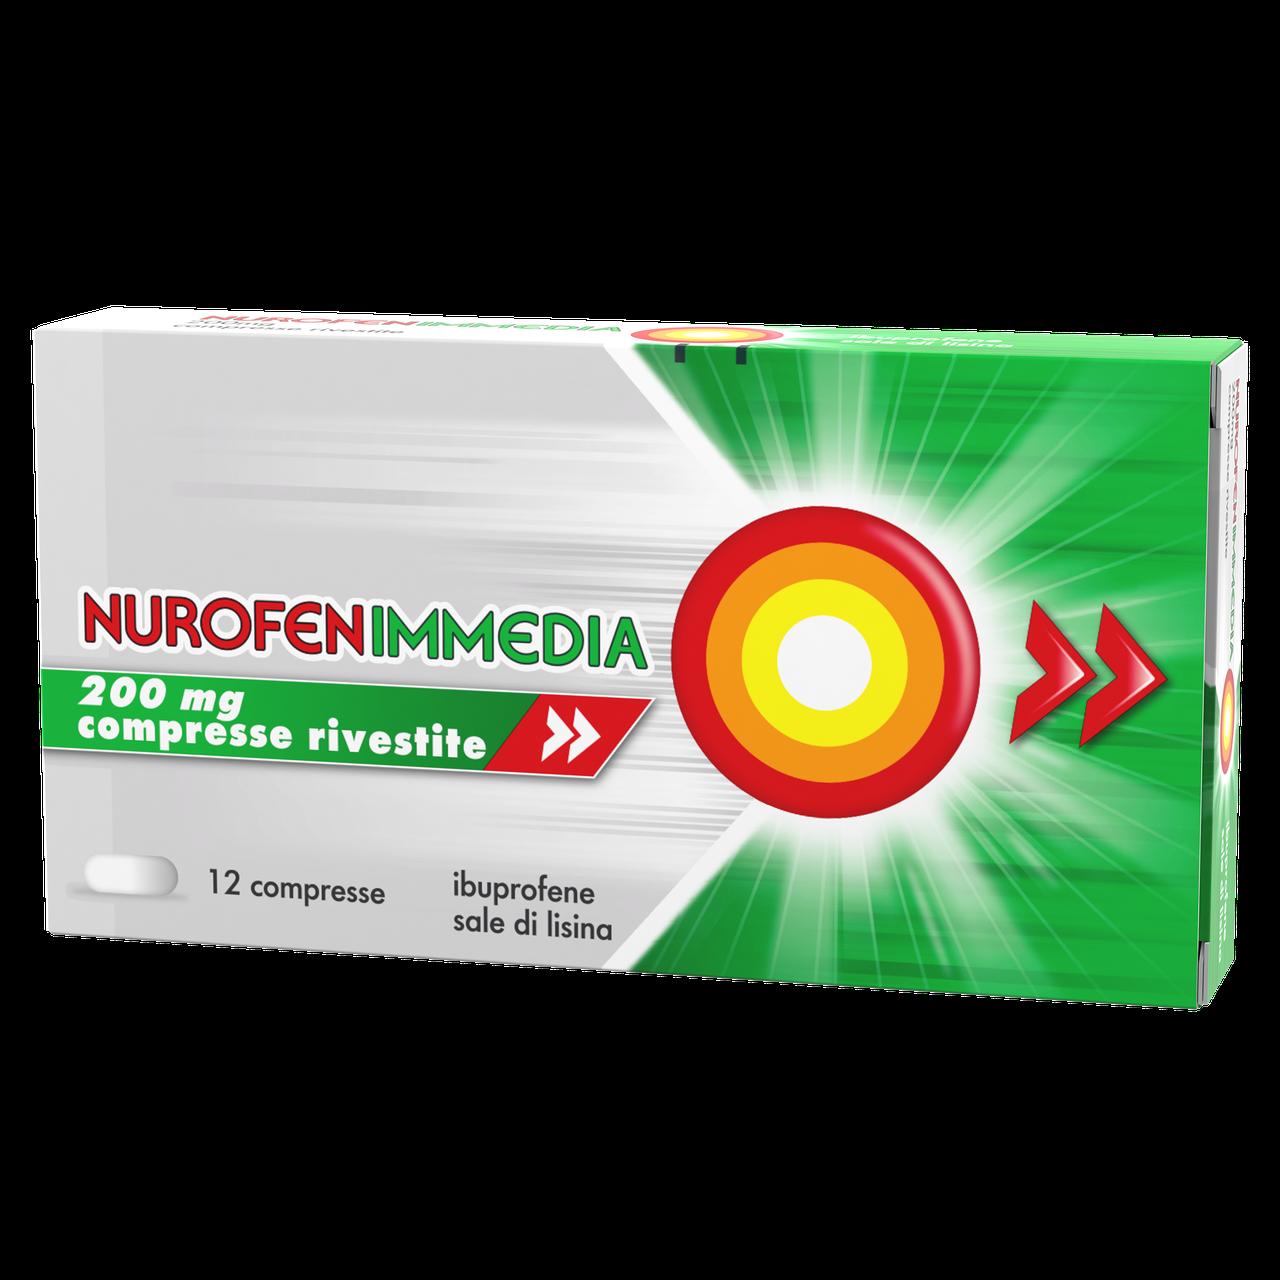 Nurofen Immedia 200mg Ibuprofene 12 compresse rivestite